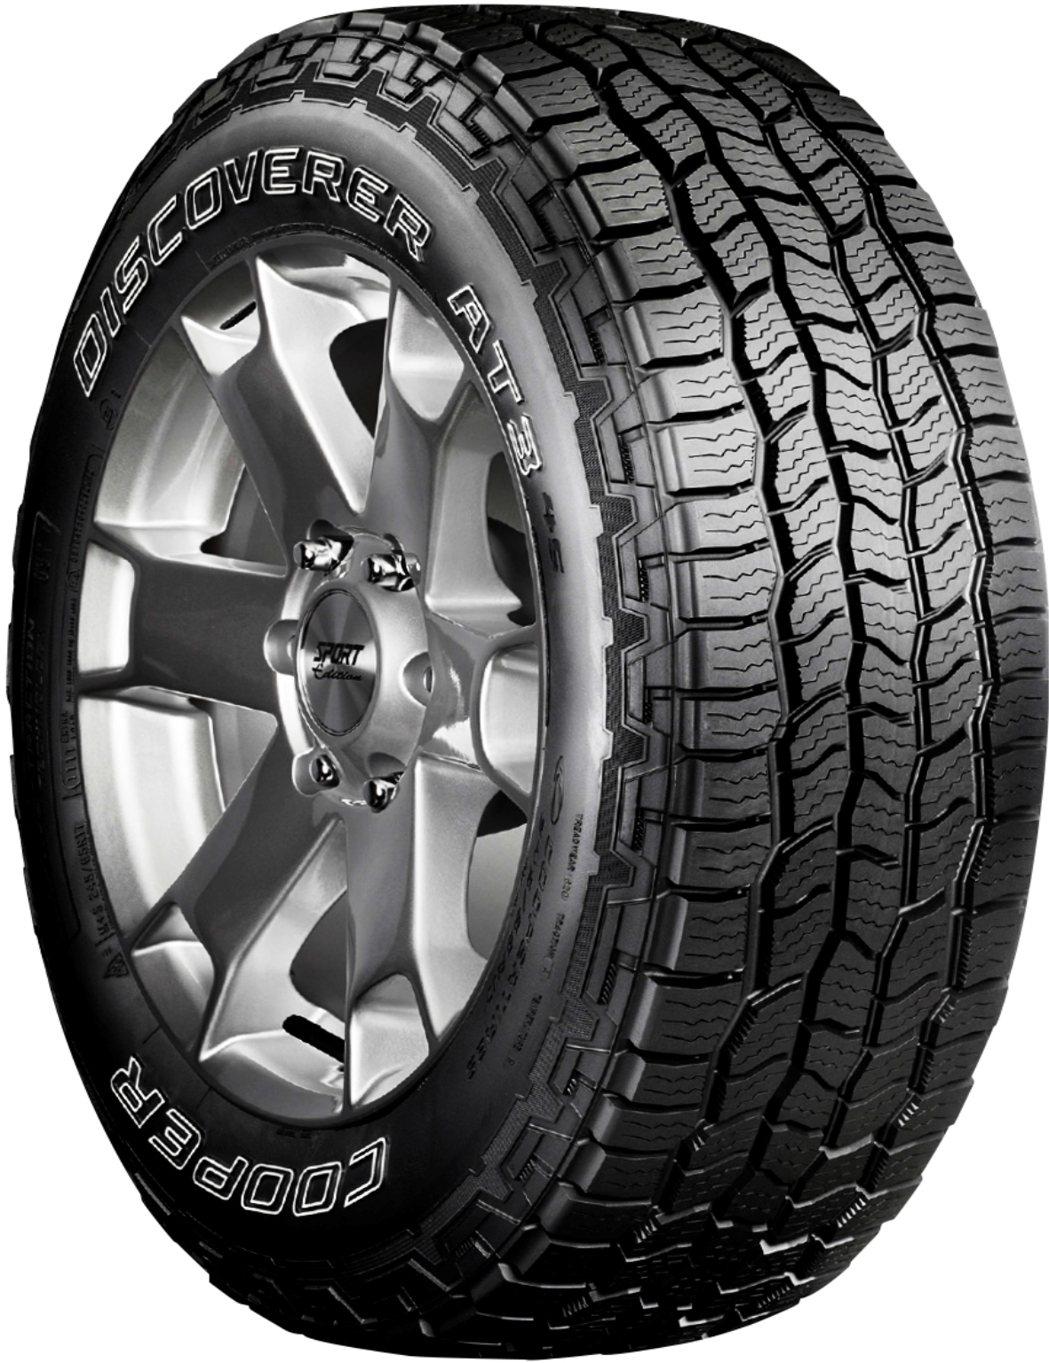 最新一代AT3家族產品-Discoverer AT3 4S™全地形越野輪胎是專為...